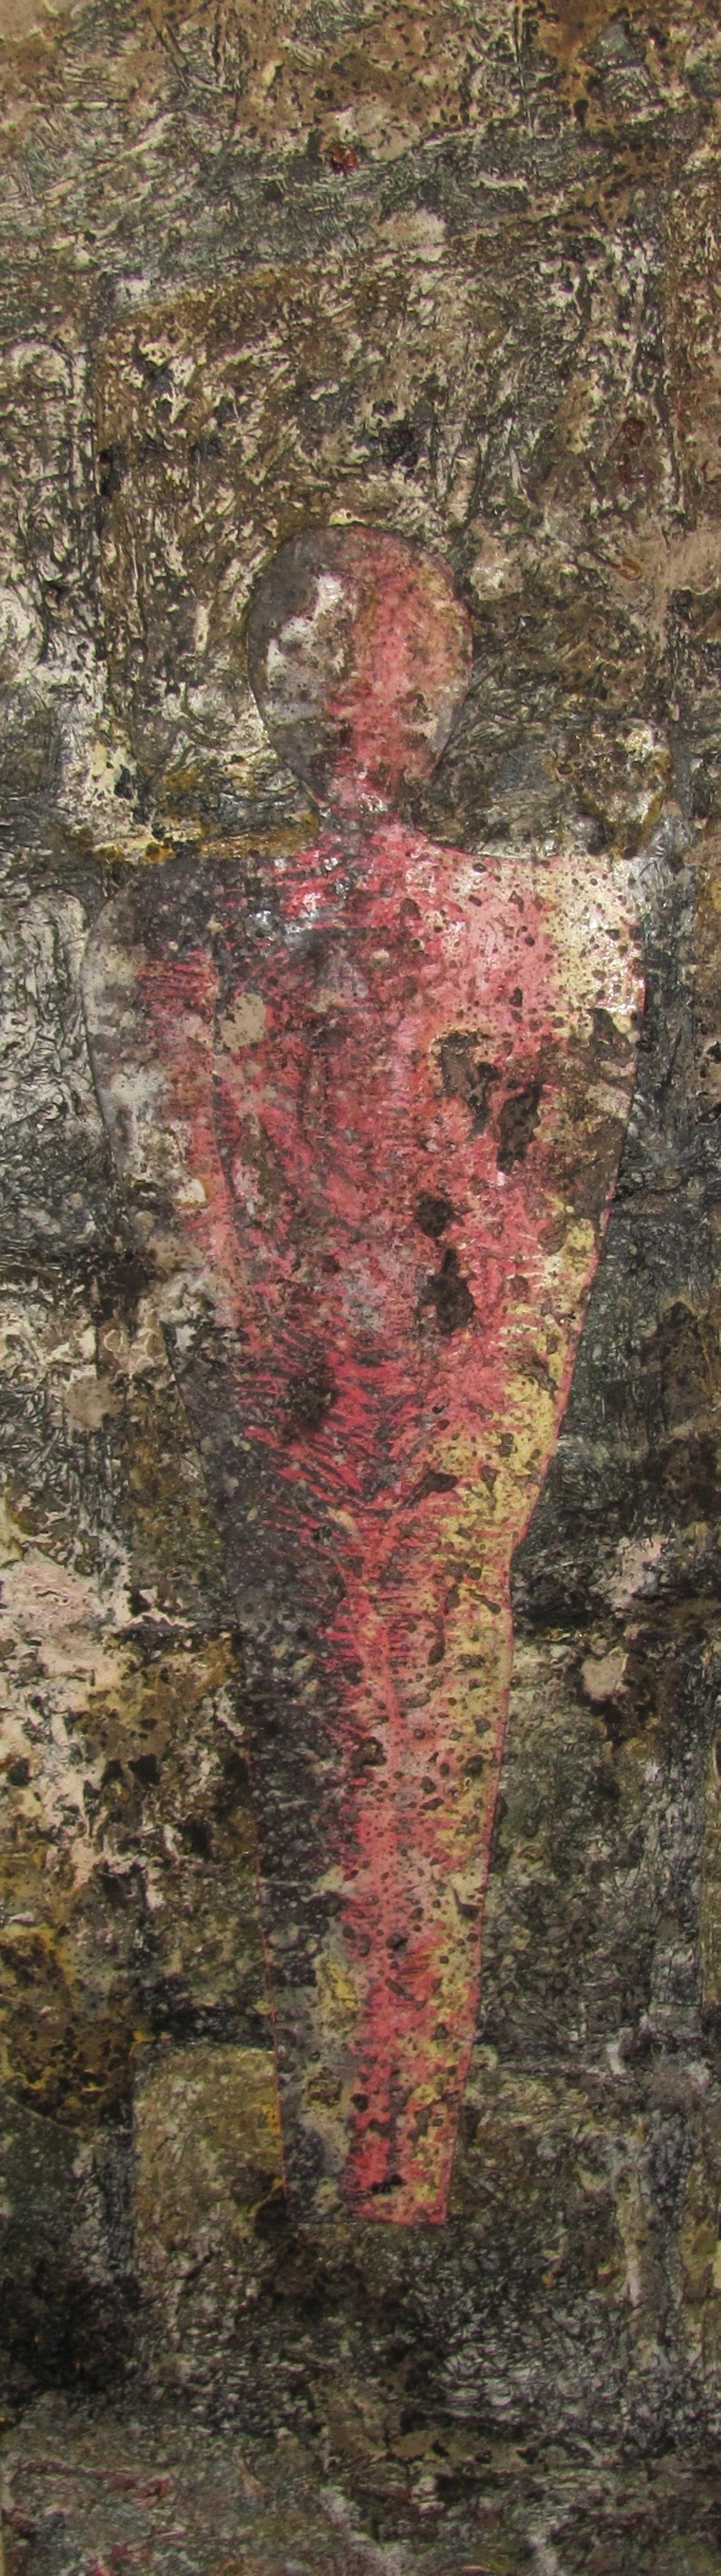 Sebanc_On the right Oil on canvas 2012 22 X 74.jpg